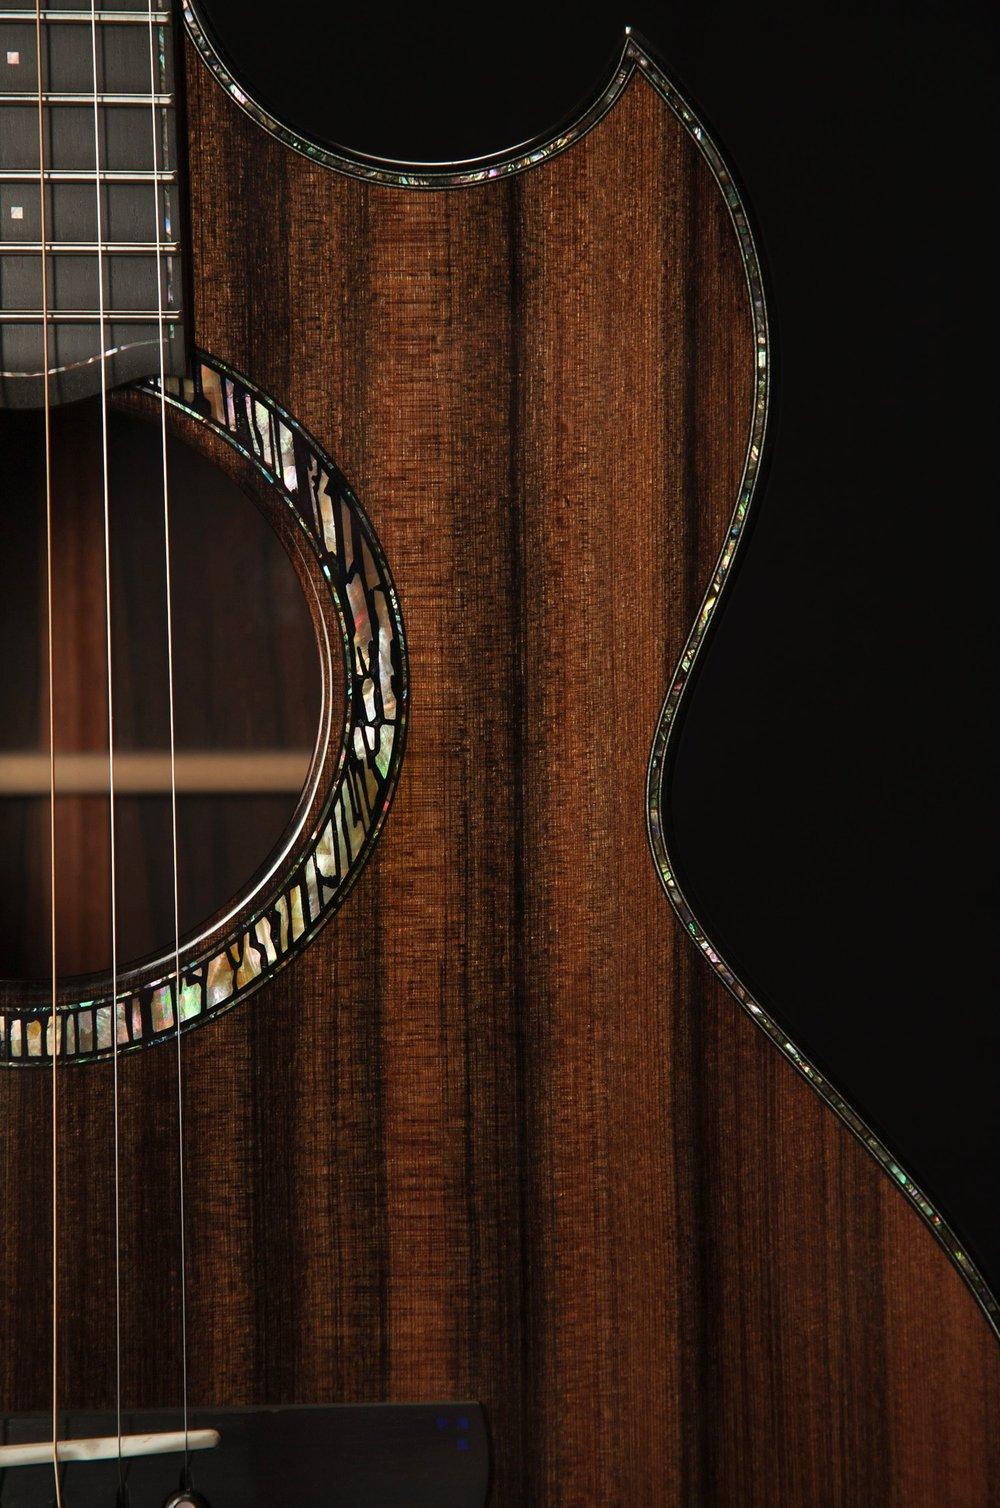 30th anniversary guitar